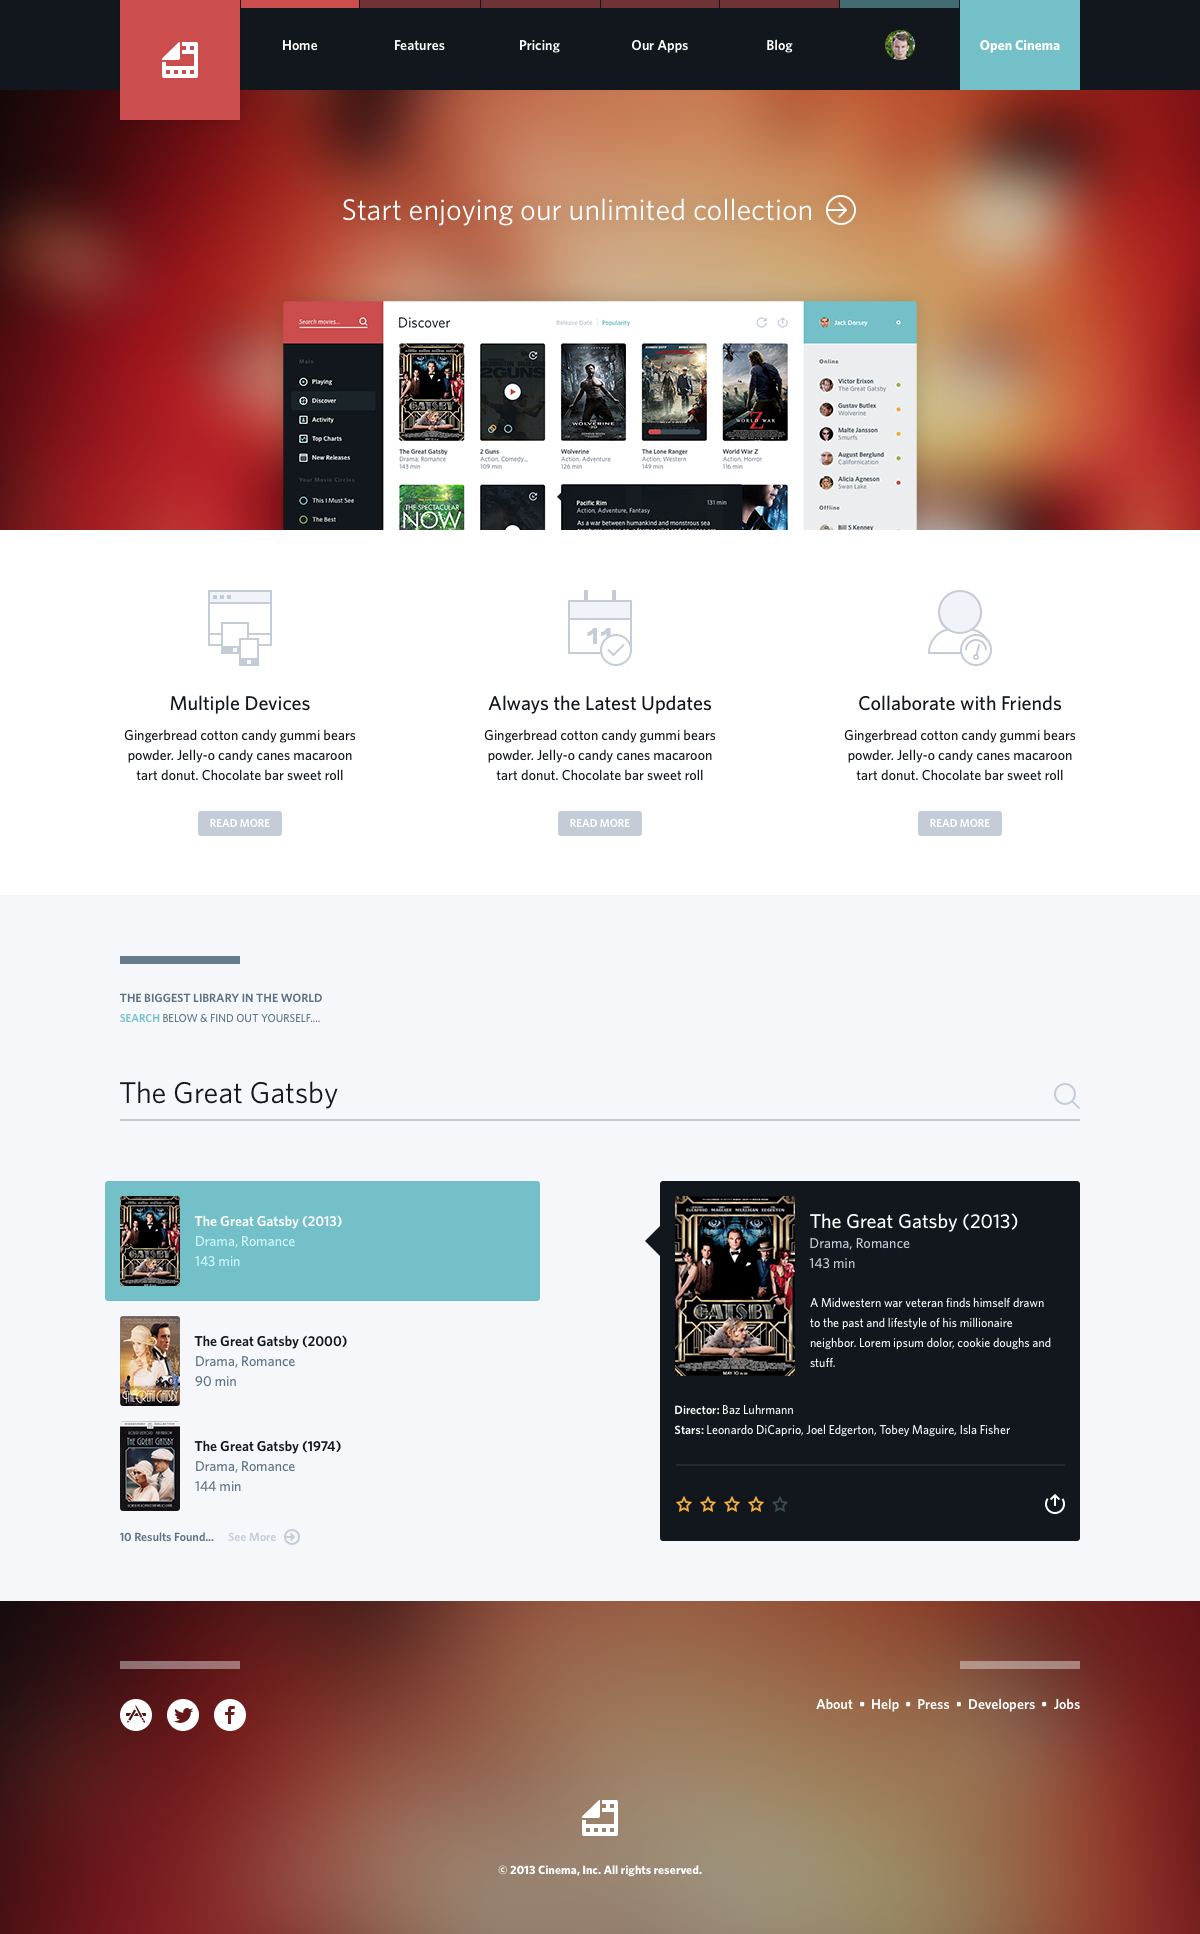 Cinema Big From Http Dribbble Com Shots 1195916 Cinema Web Attachments 158387 Web Design Gallery Fun Website Design Web Template Design